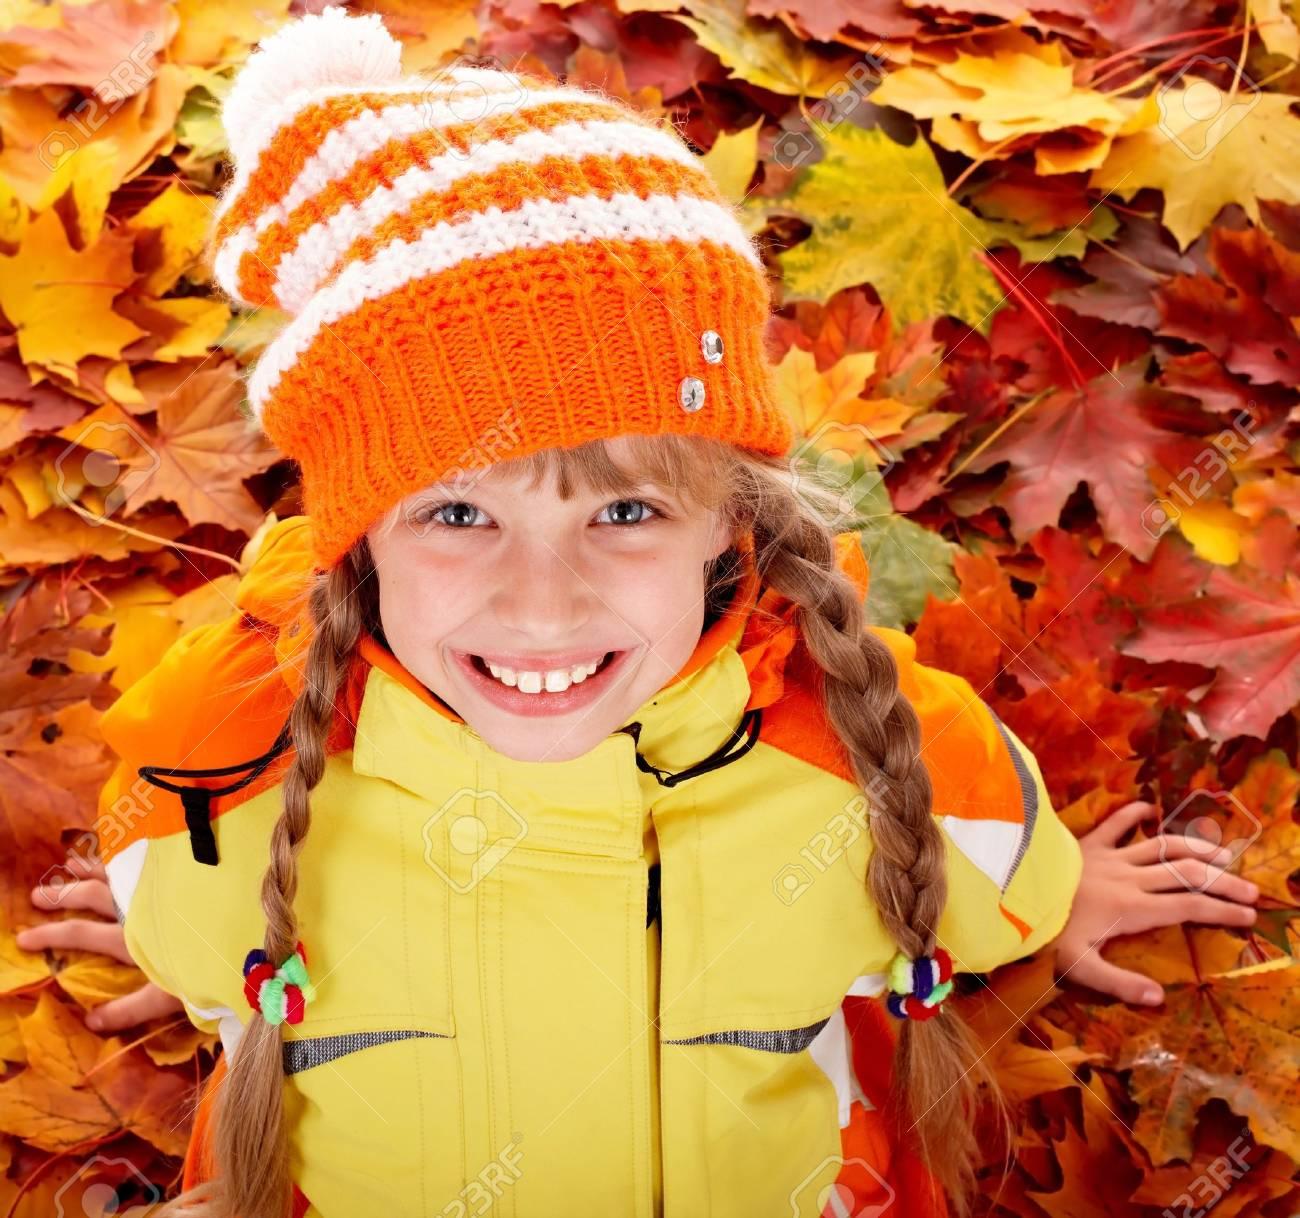 Girl in autumn orange  hat on leaf background.Outdoor. Stock Photo - 5695416